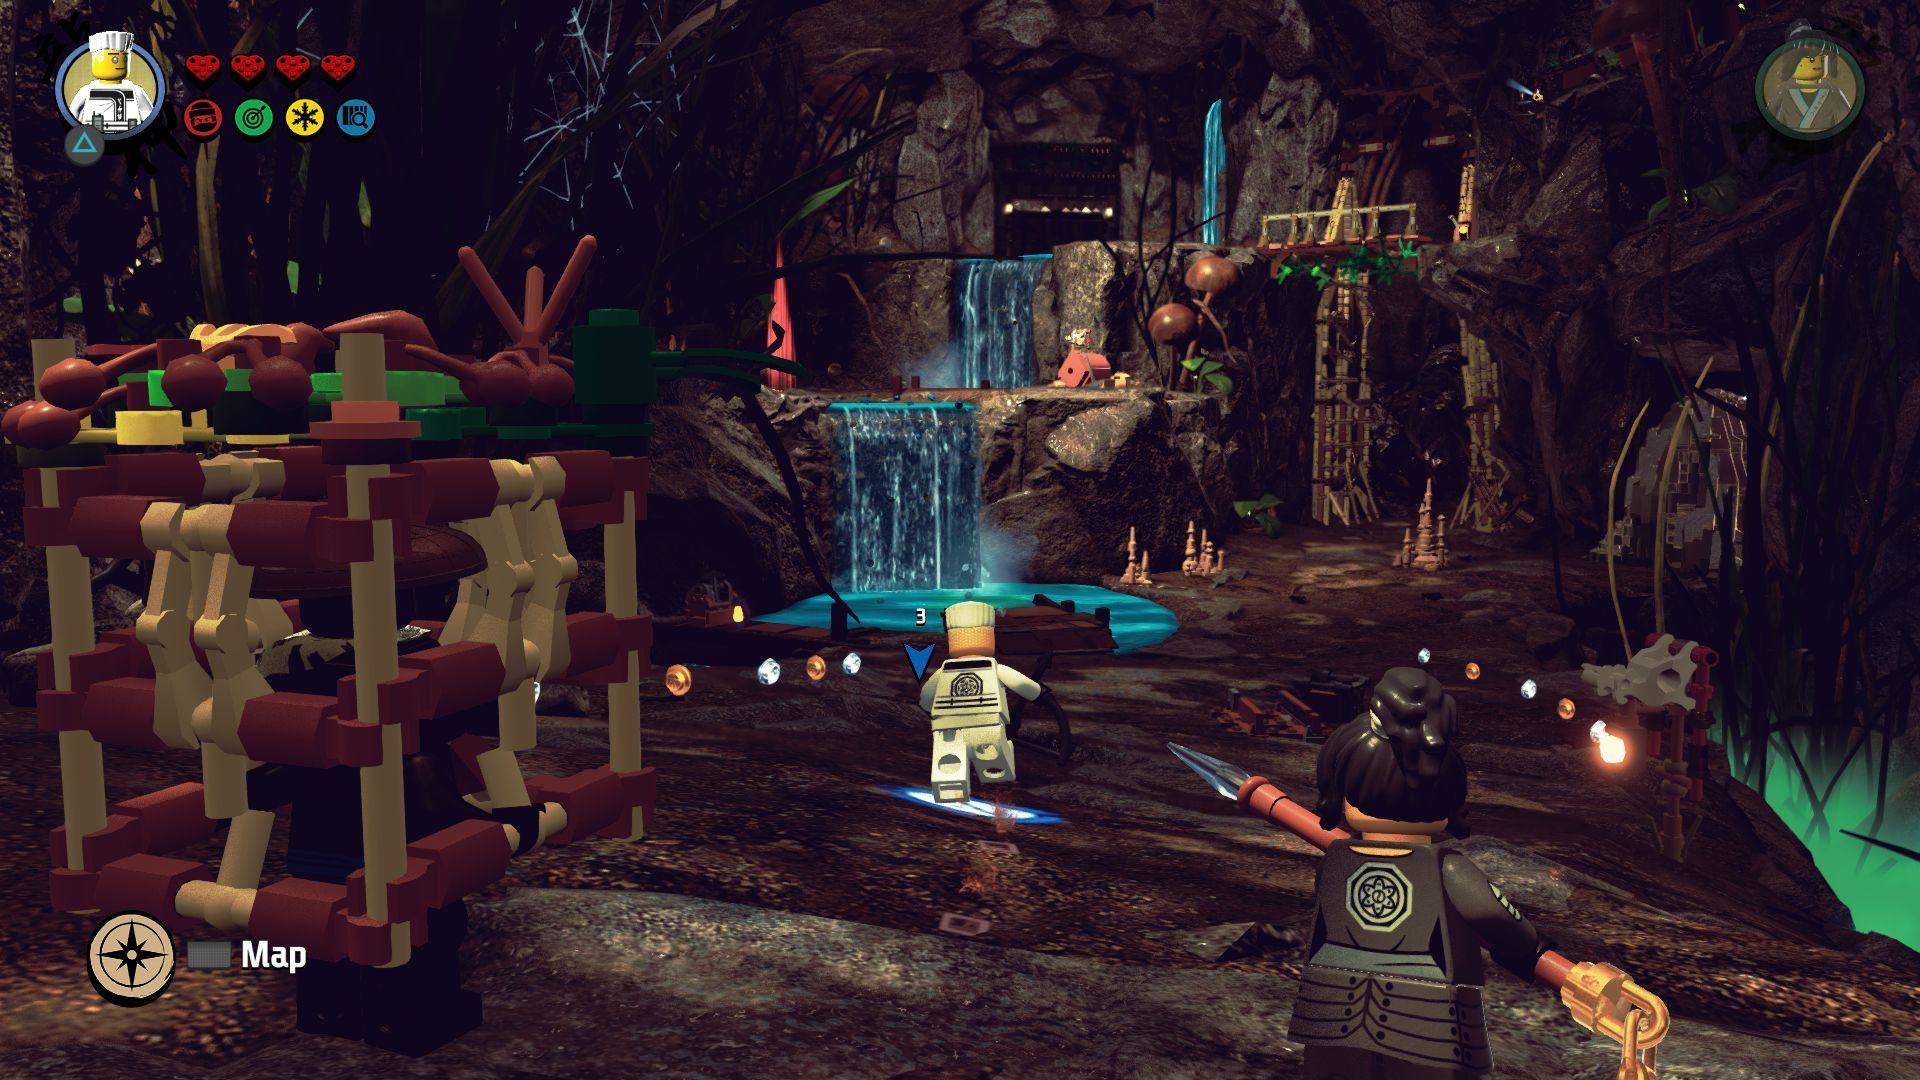 LEGO Ninjago Movie Video Game - jak se legáček nindžou stal 151103